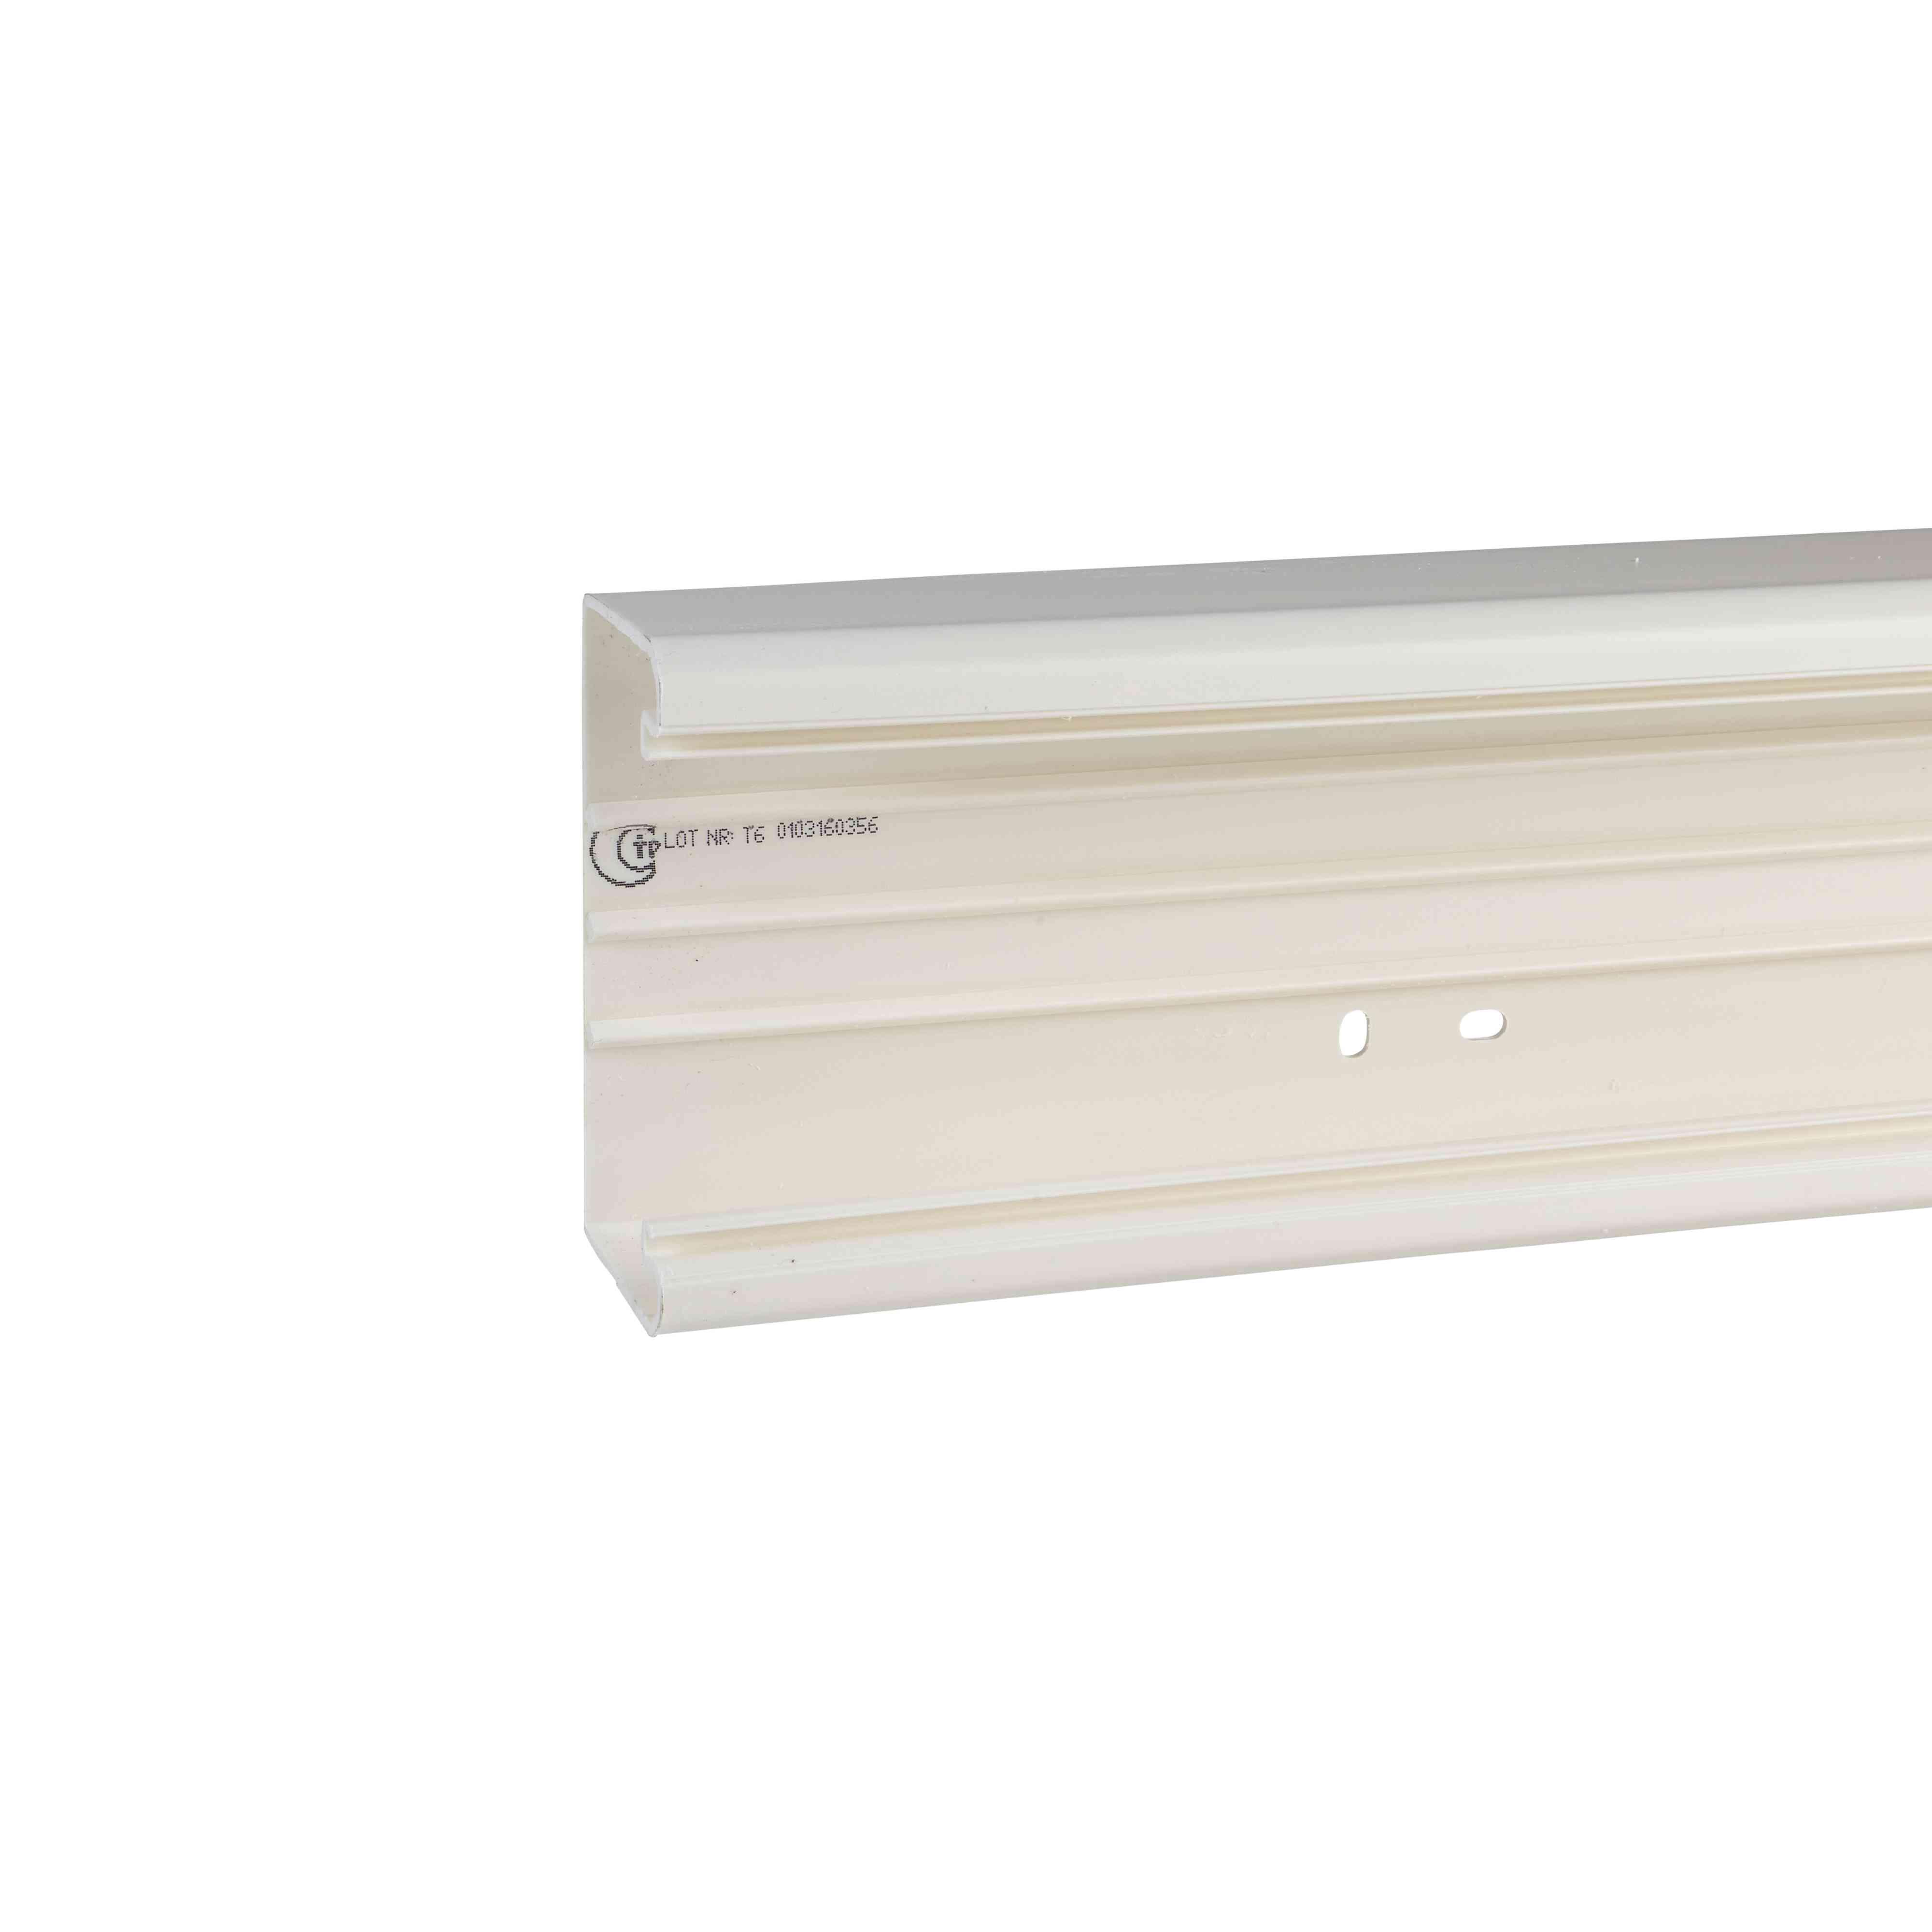 Ultra - namestitveni kanali - 151 x 50 mm - plastični - beli - 2 m